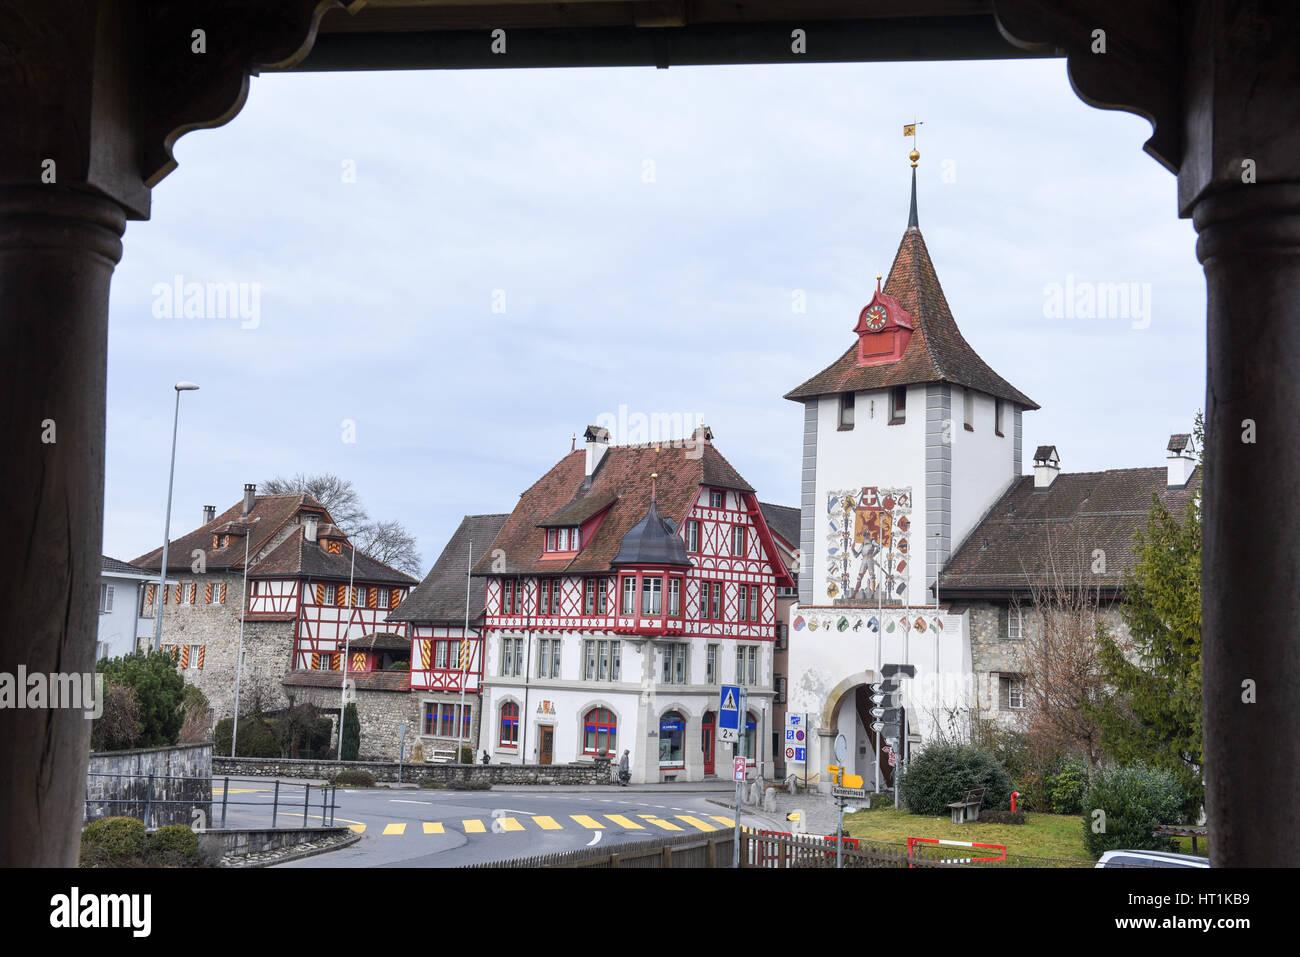 Sempach, Switzerland - 4 March 2017: medieval houses of the village of Sempach on Switzerland Stock Photo